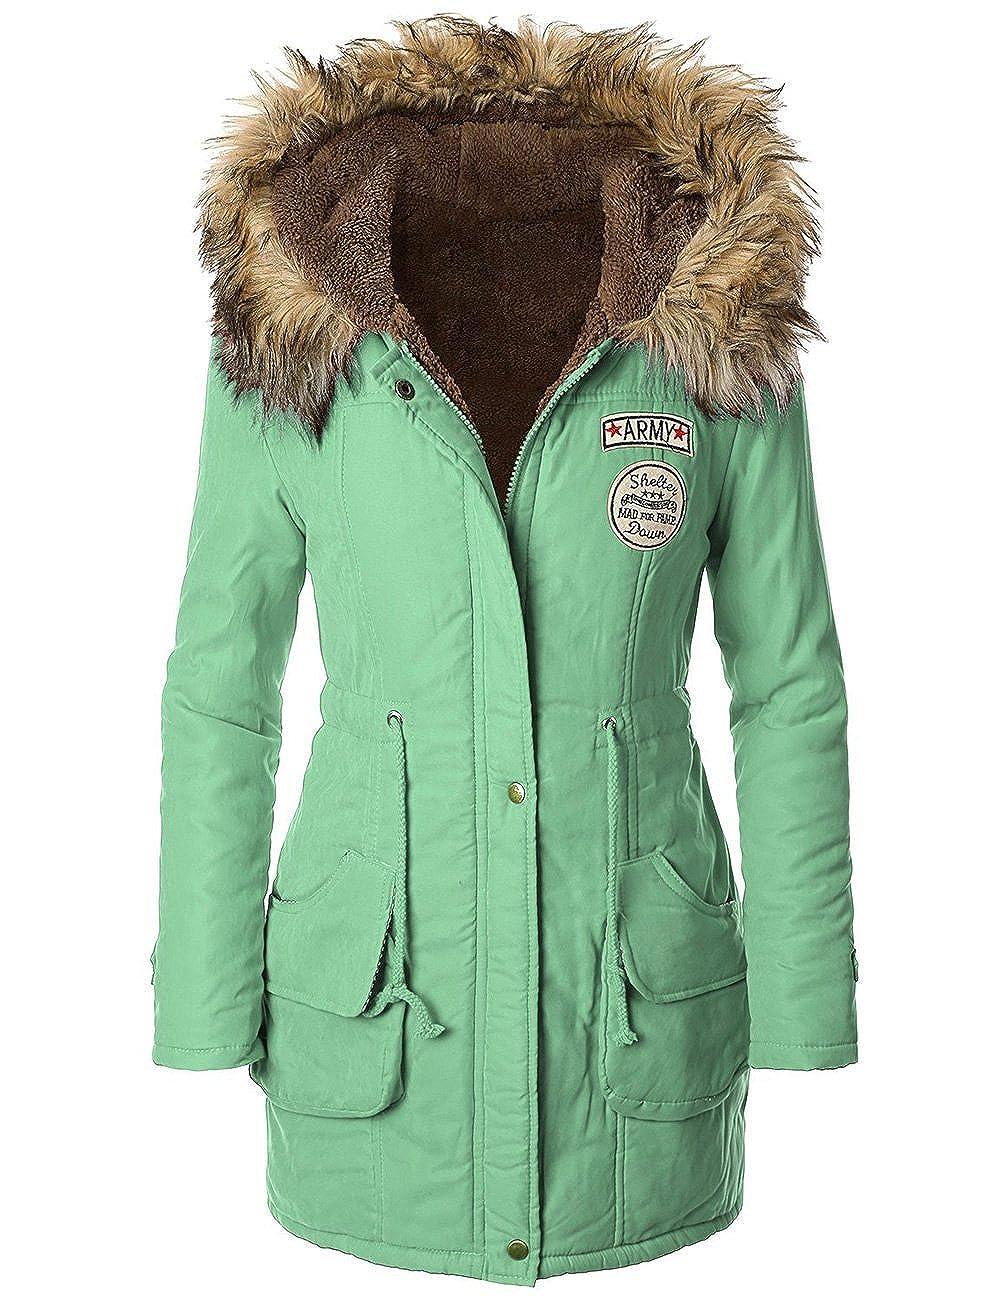 American Trends Women's Faux Fur Lined Hooded Outdoor Winter Parka Coats Long Jacket ACAS8110C0000